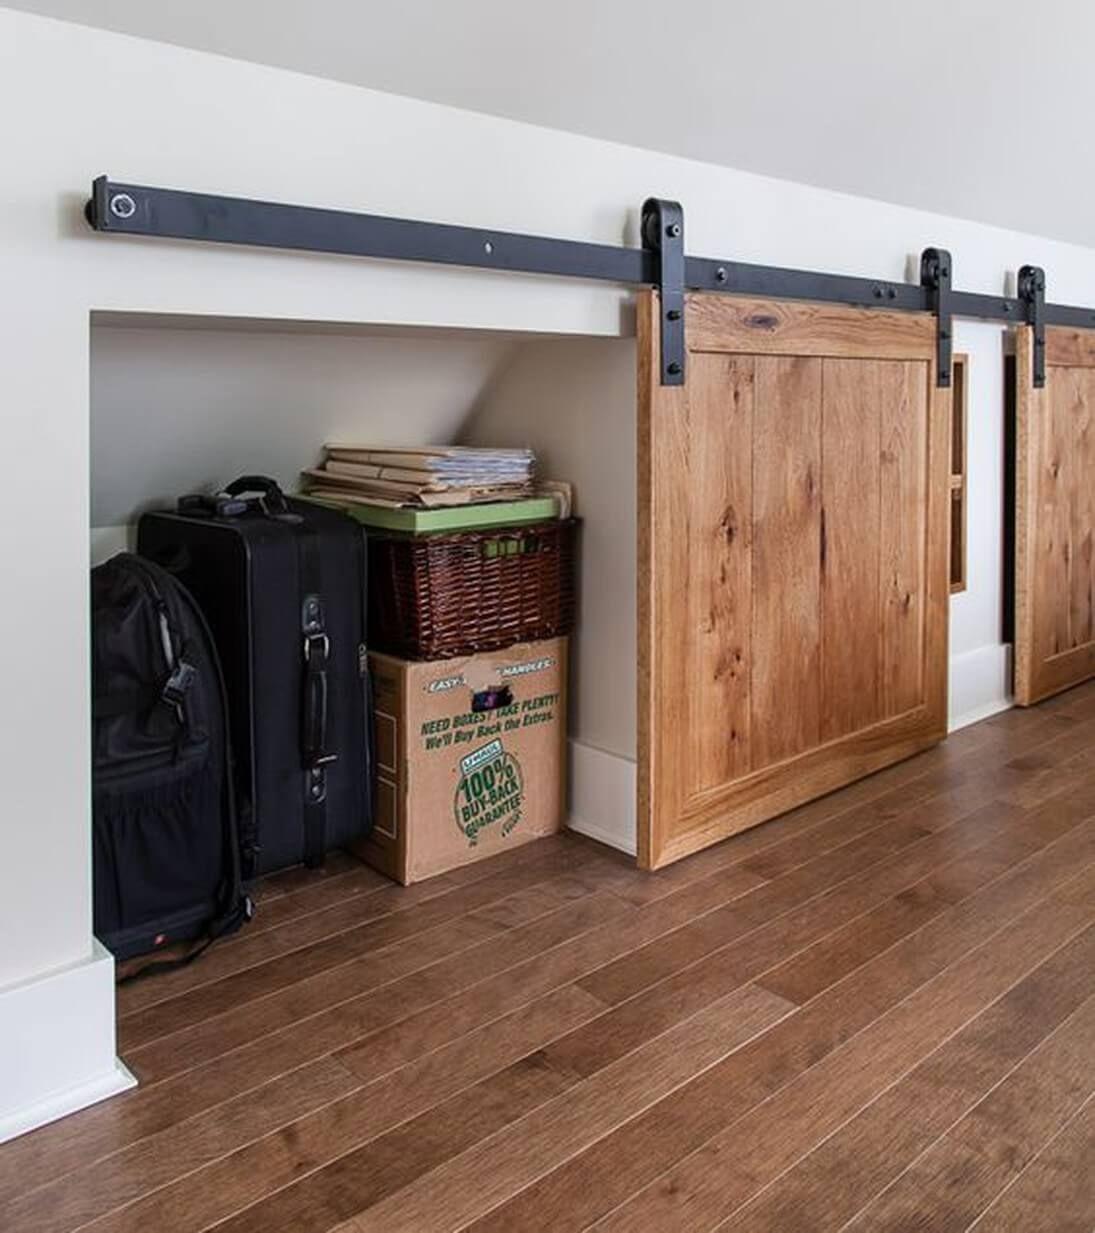 By Merigo Design: Sliding Barn Door Storage Nooks